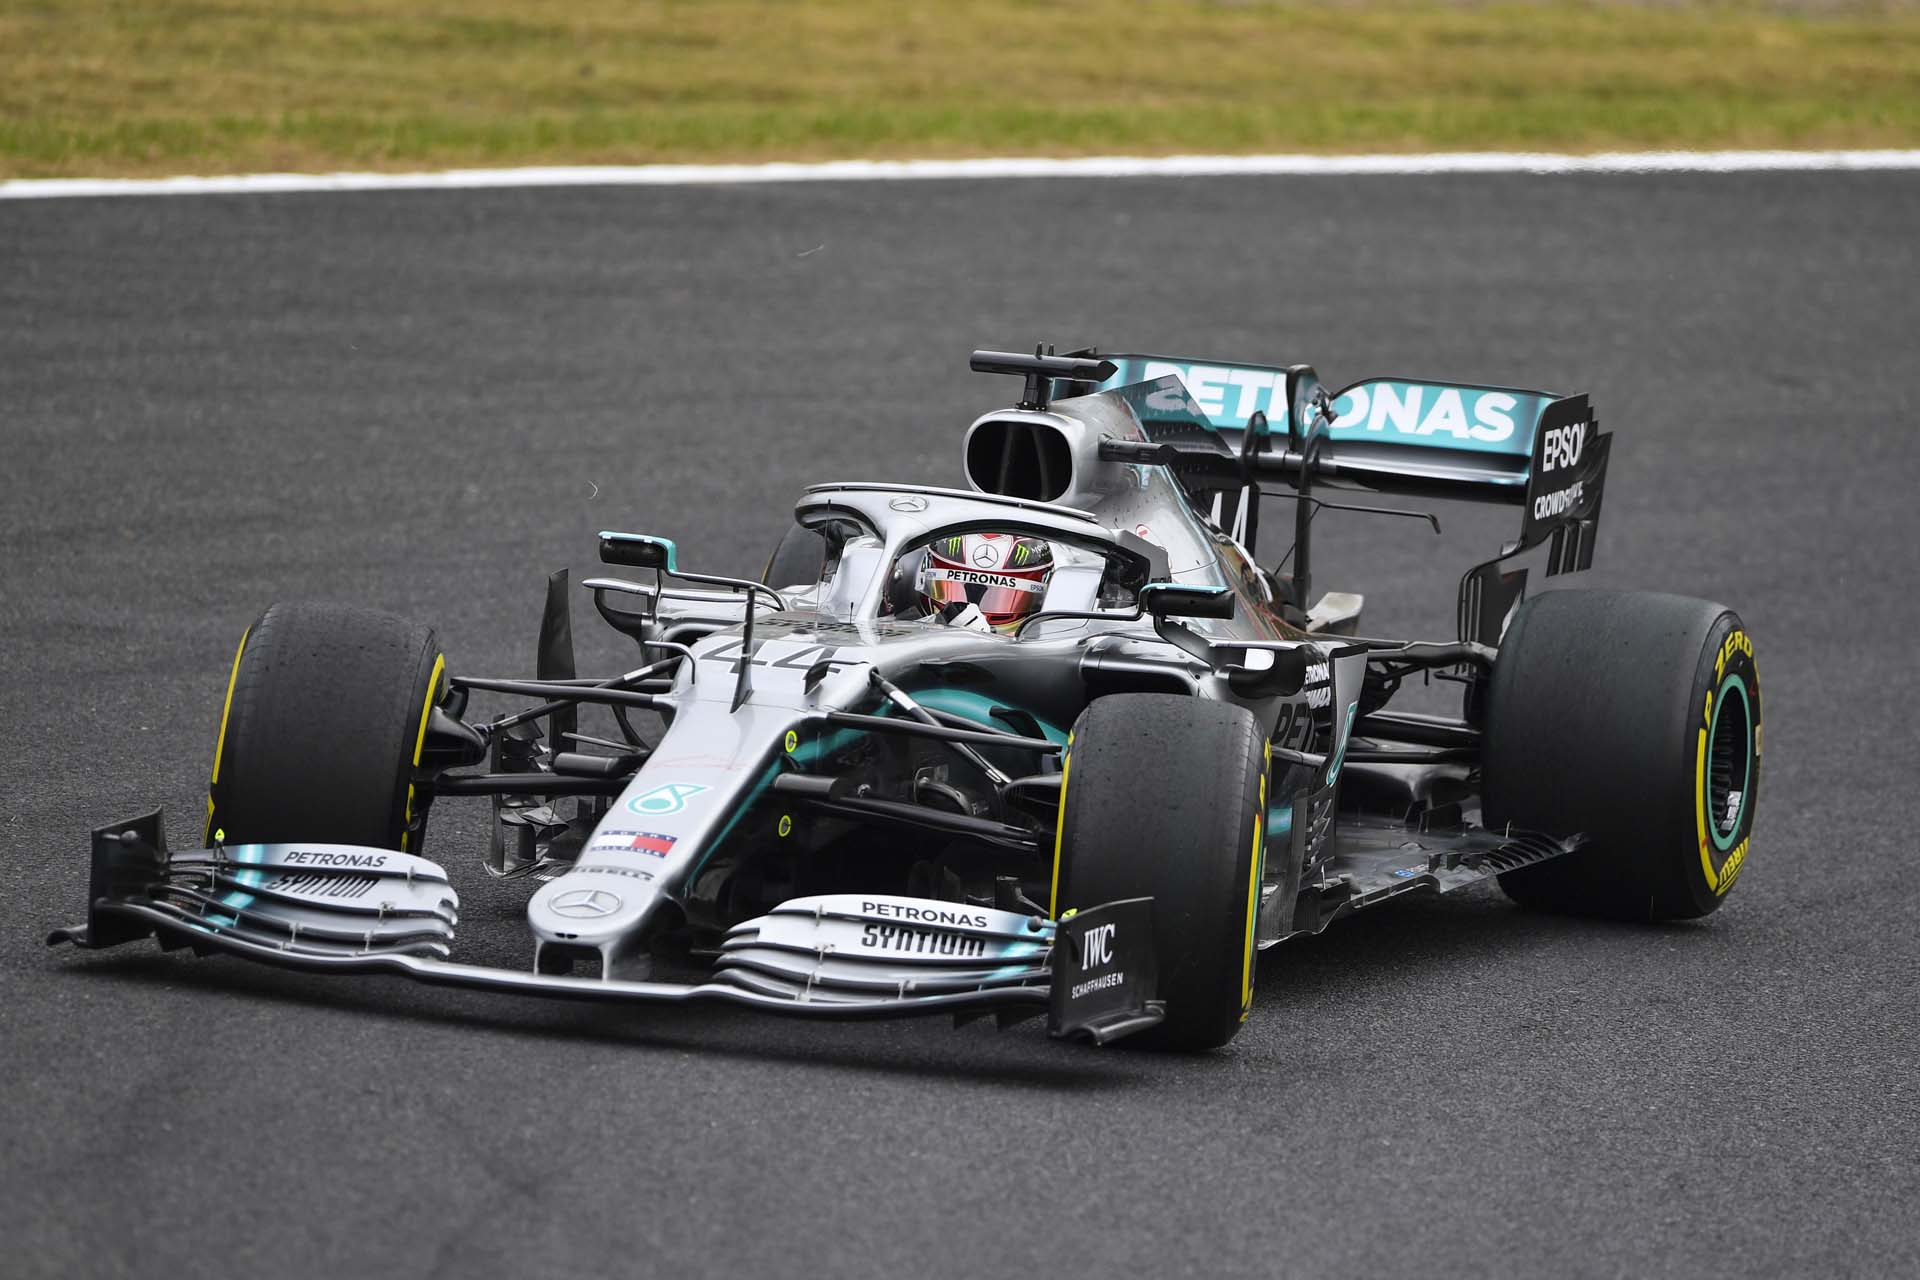 2019 Japanese Grand Prix, Friday - LAT Images